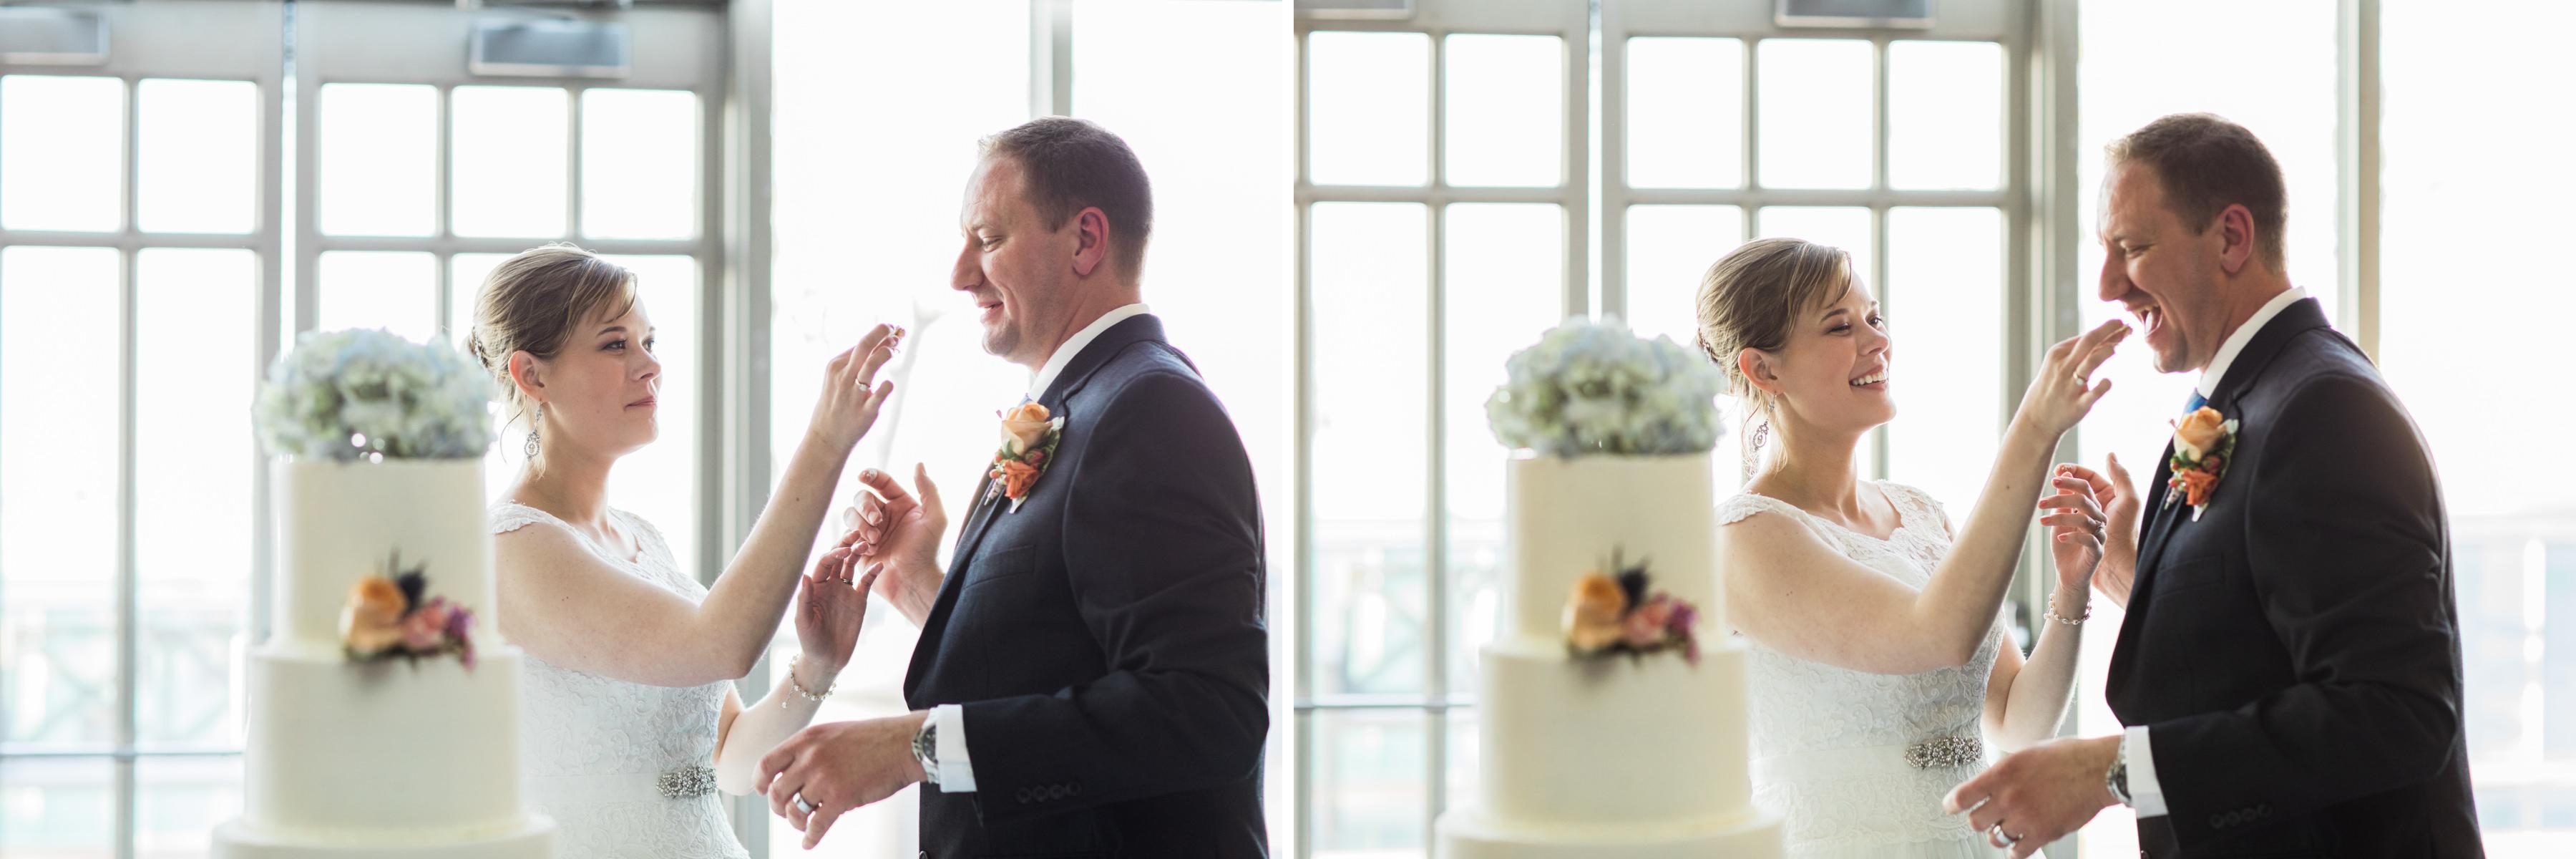 MAULDIN_WEDDING_MONTGOMERY_ALABAMA_WEDDING_PHOTOGRAPHY_113